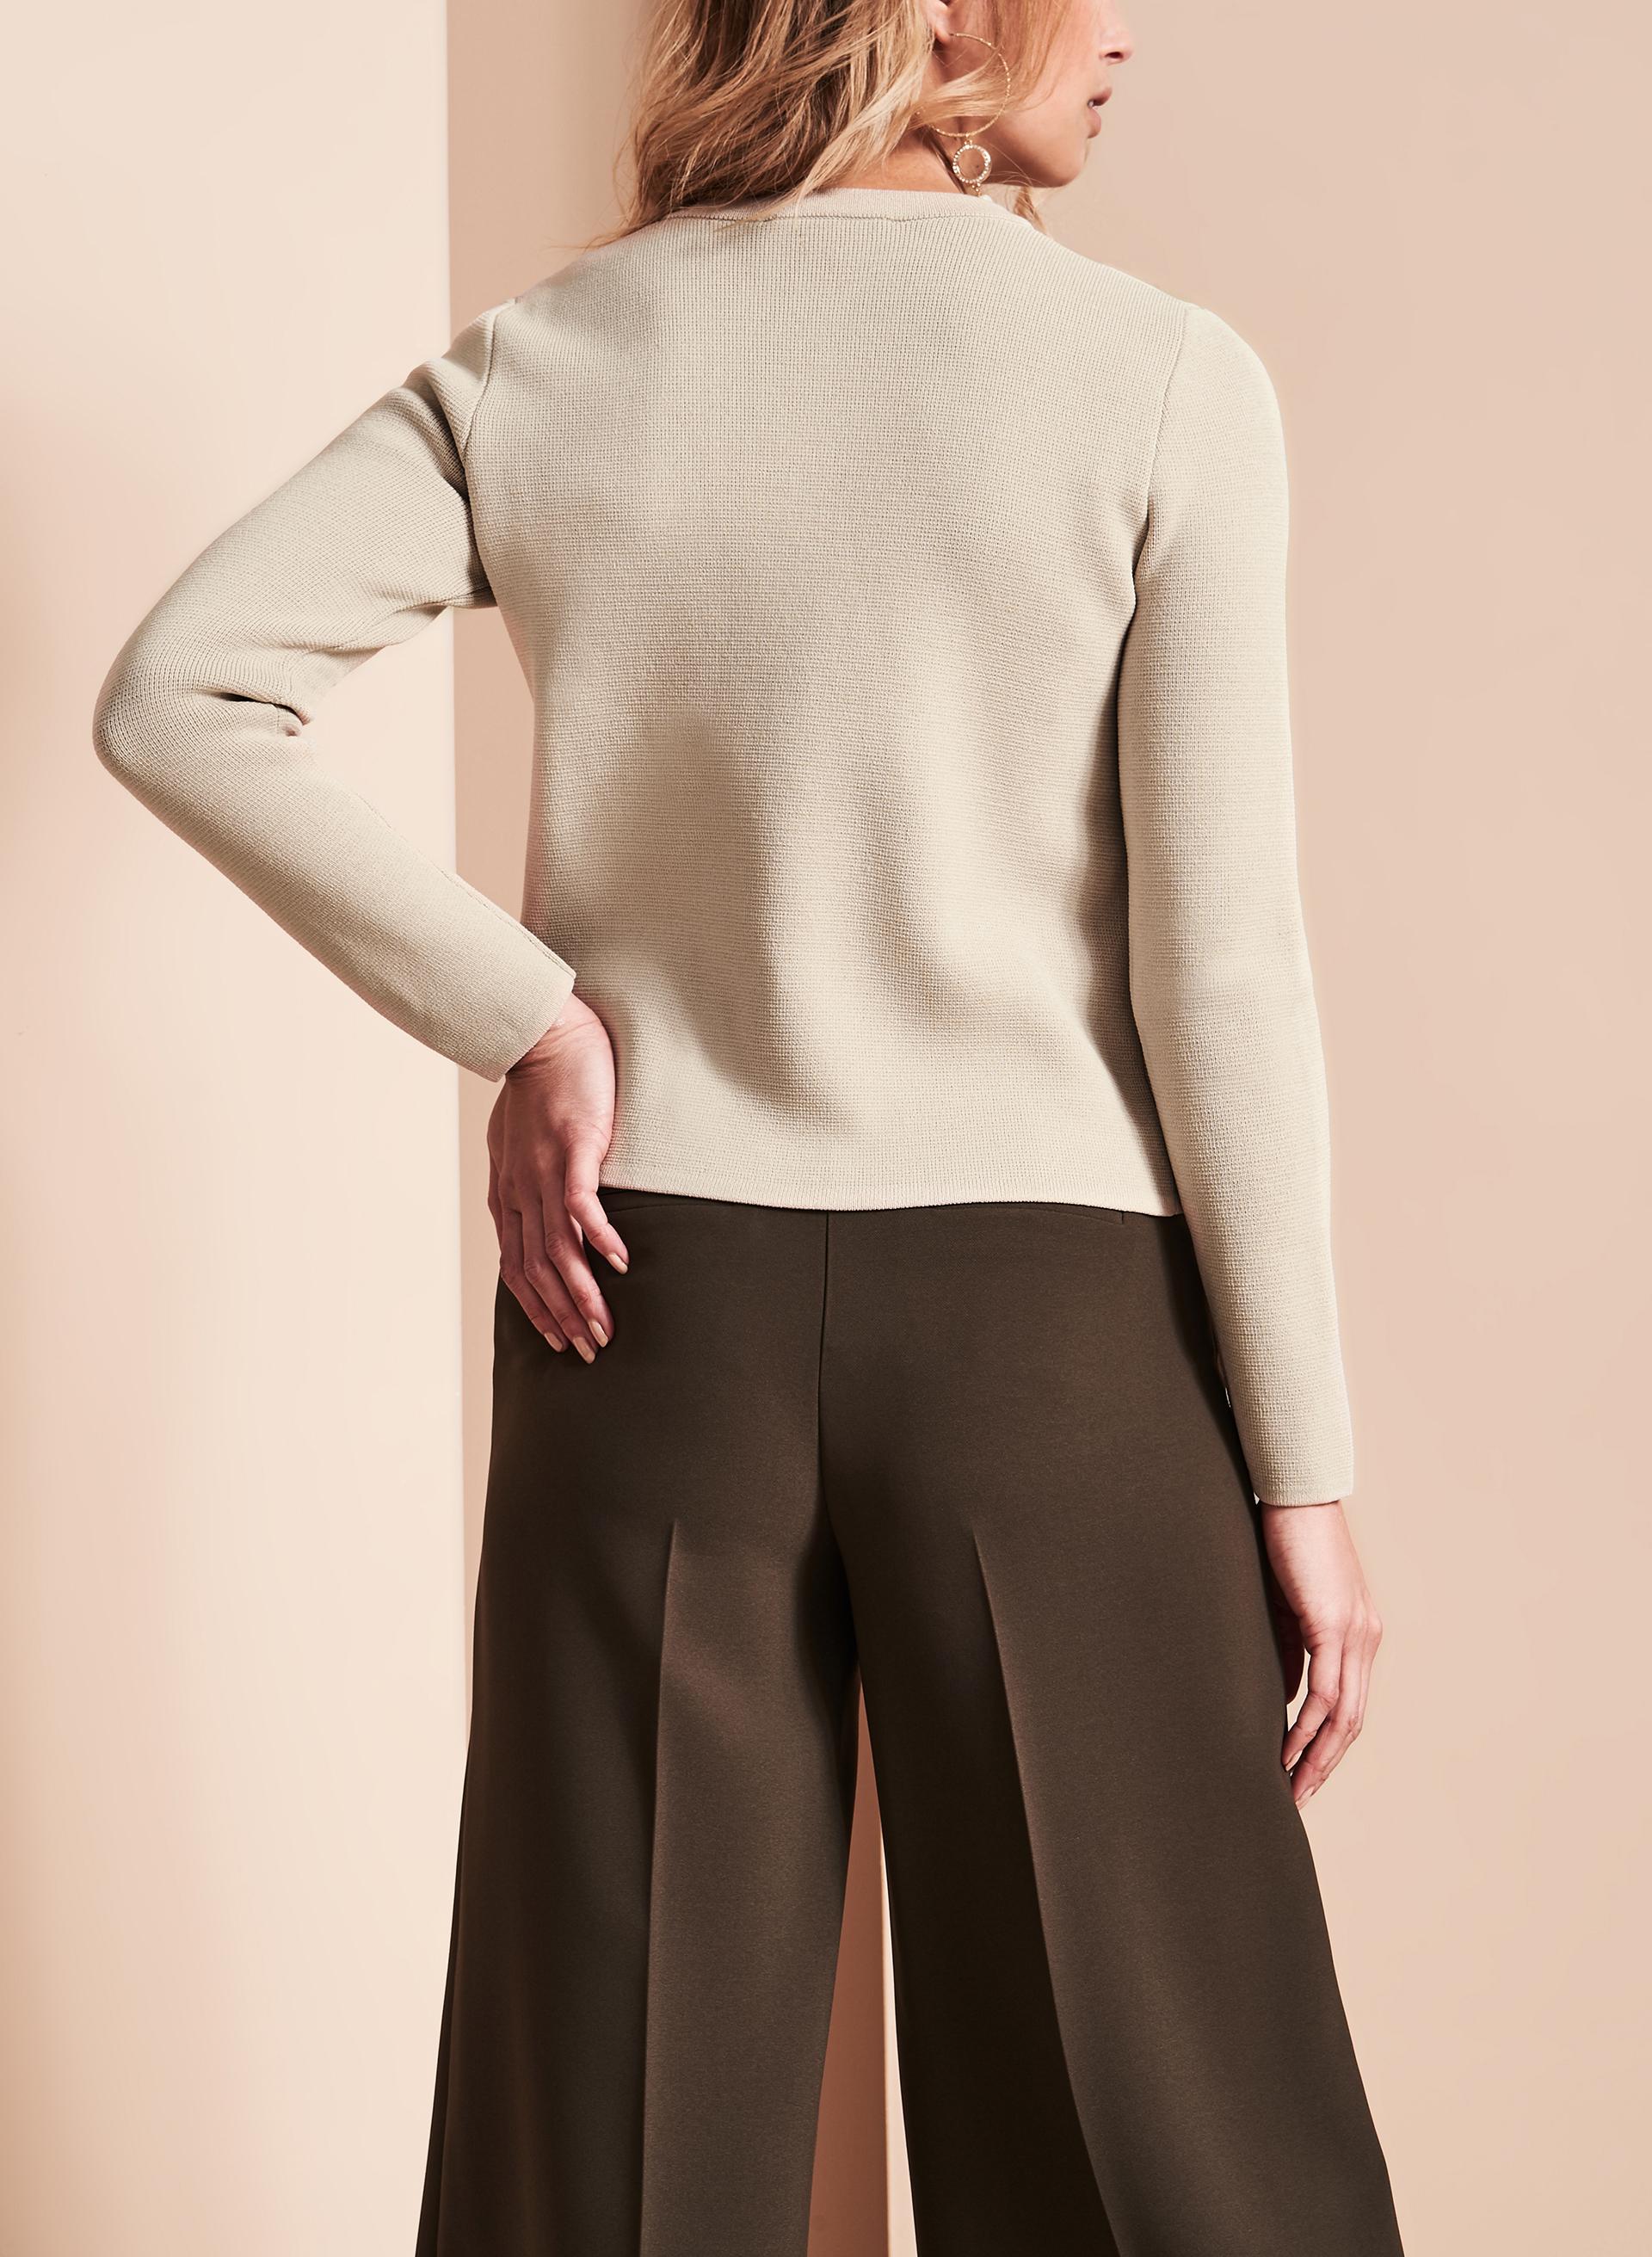 Knitting Cardigan Collar : Notch collar knit cardigan free shipping melanie lyne